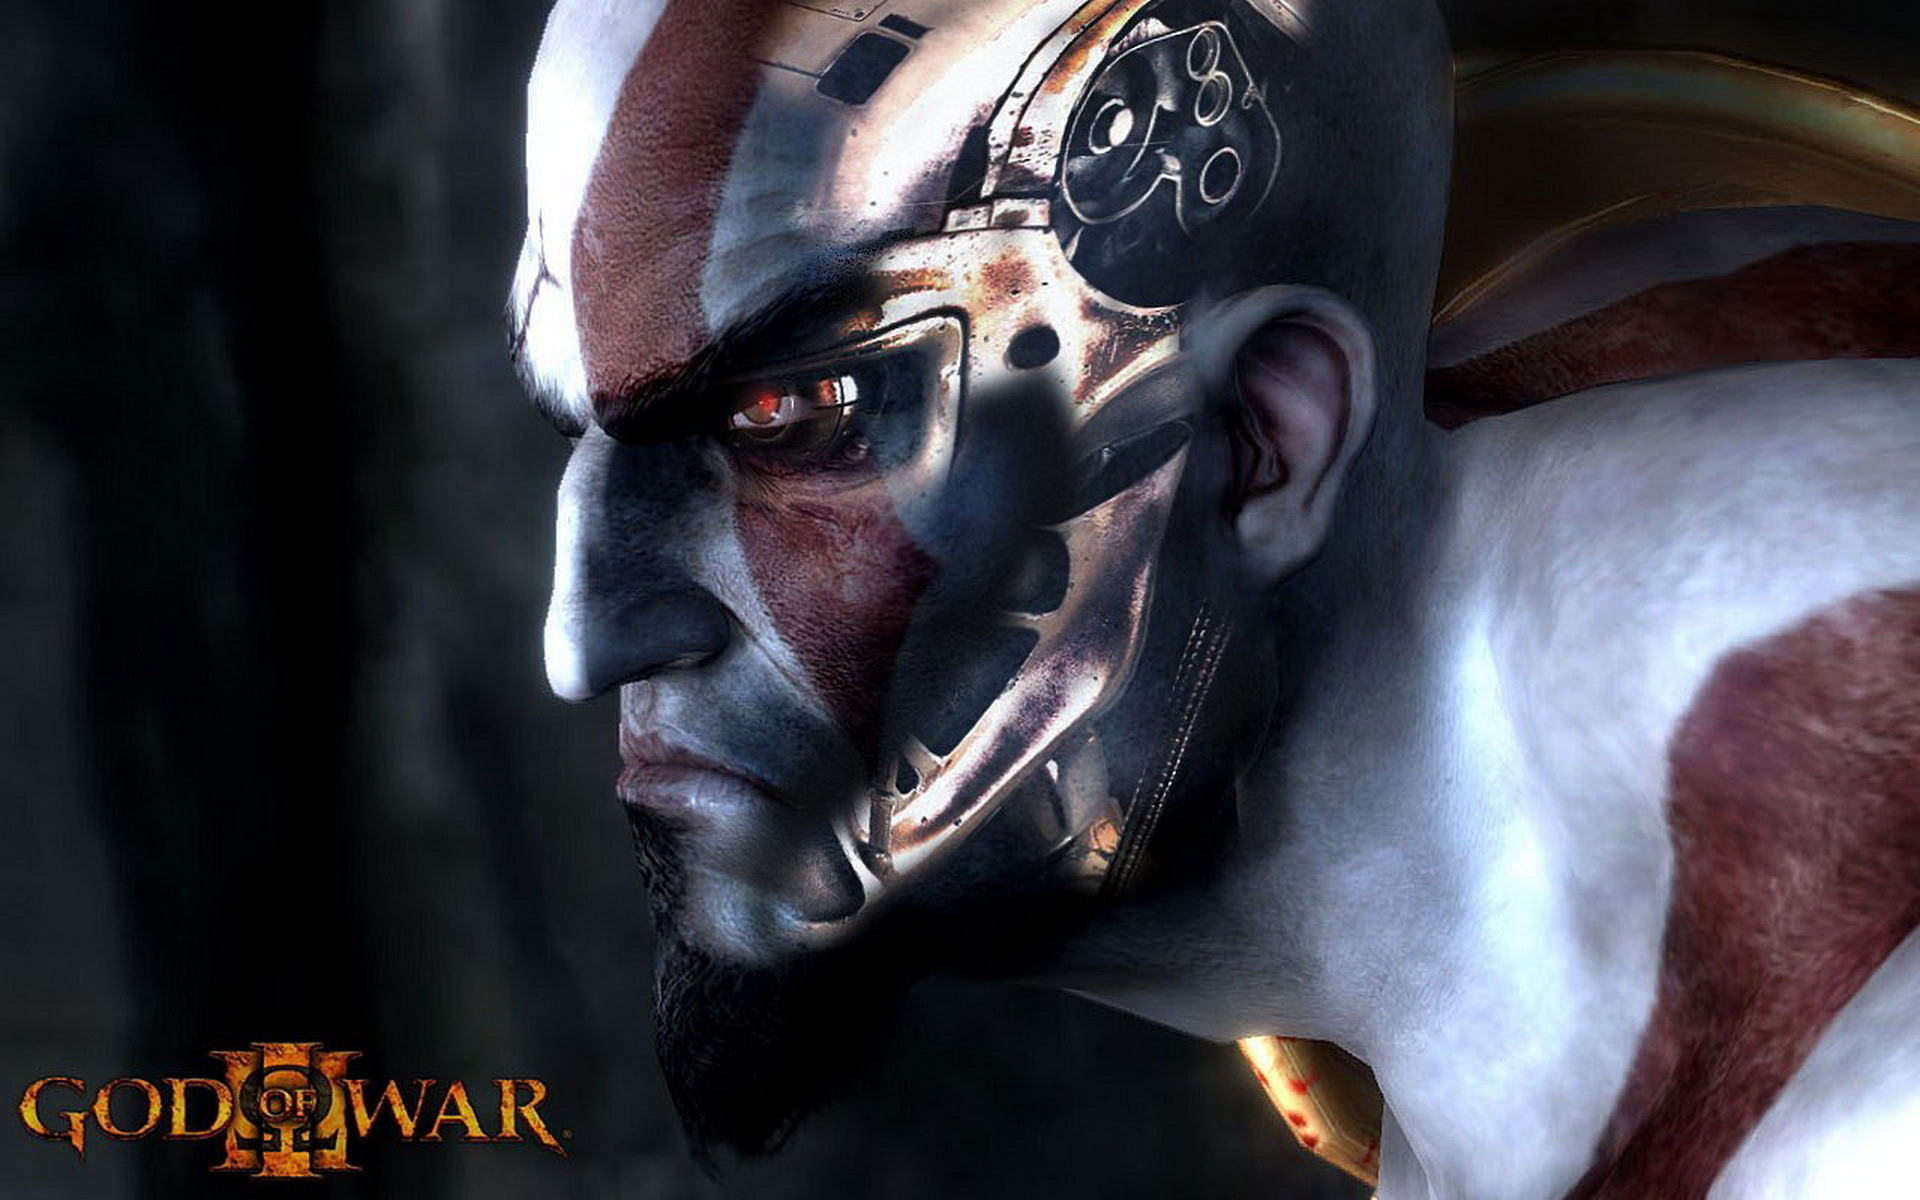 God Of War III HD Wallpaper | Background Image | 1920x1200